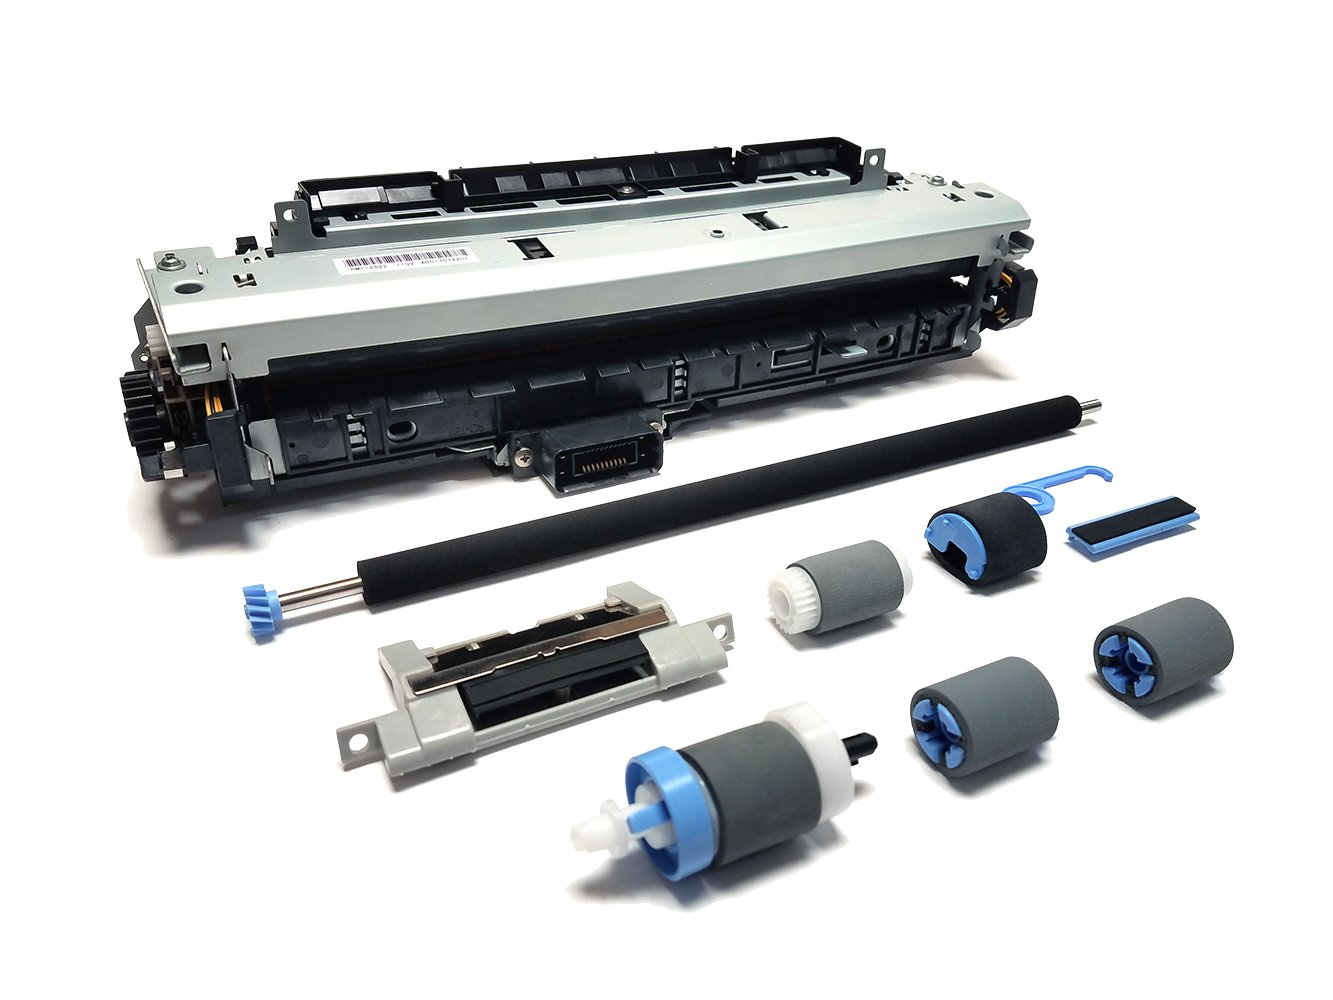 Altru Print Q7543-67909-MK-DLX-AP (Q7543A. RM1-2522) Deluxe Maintenance Kit for HP Laserjet 5200 (110V) Includes RM1-2522 Fuser, Transfer Roller & Tray 1-3 Rollers